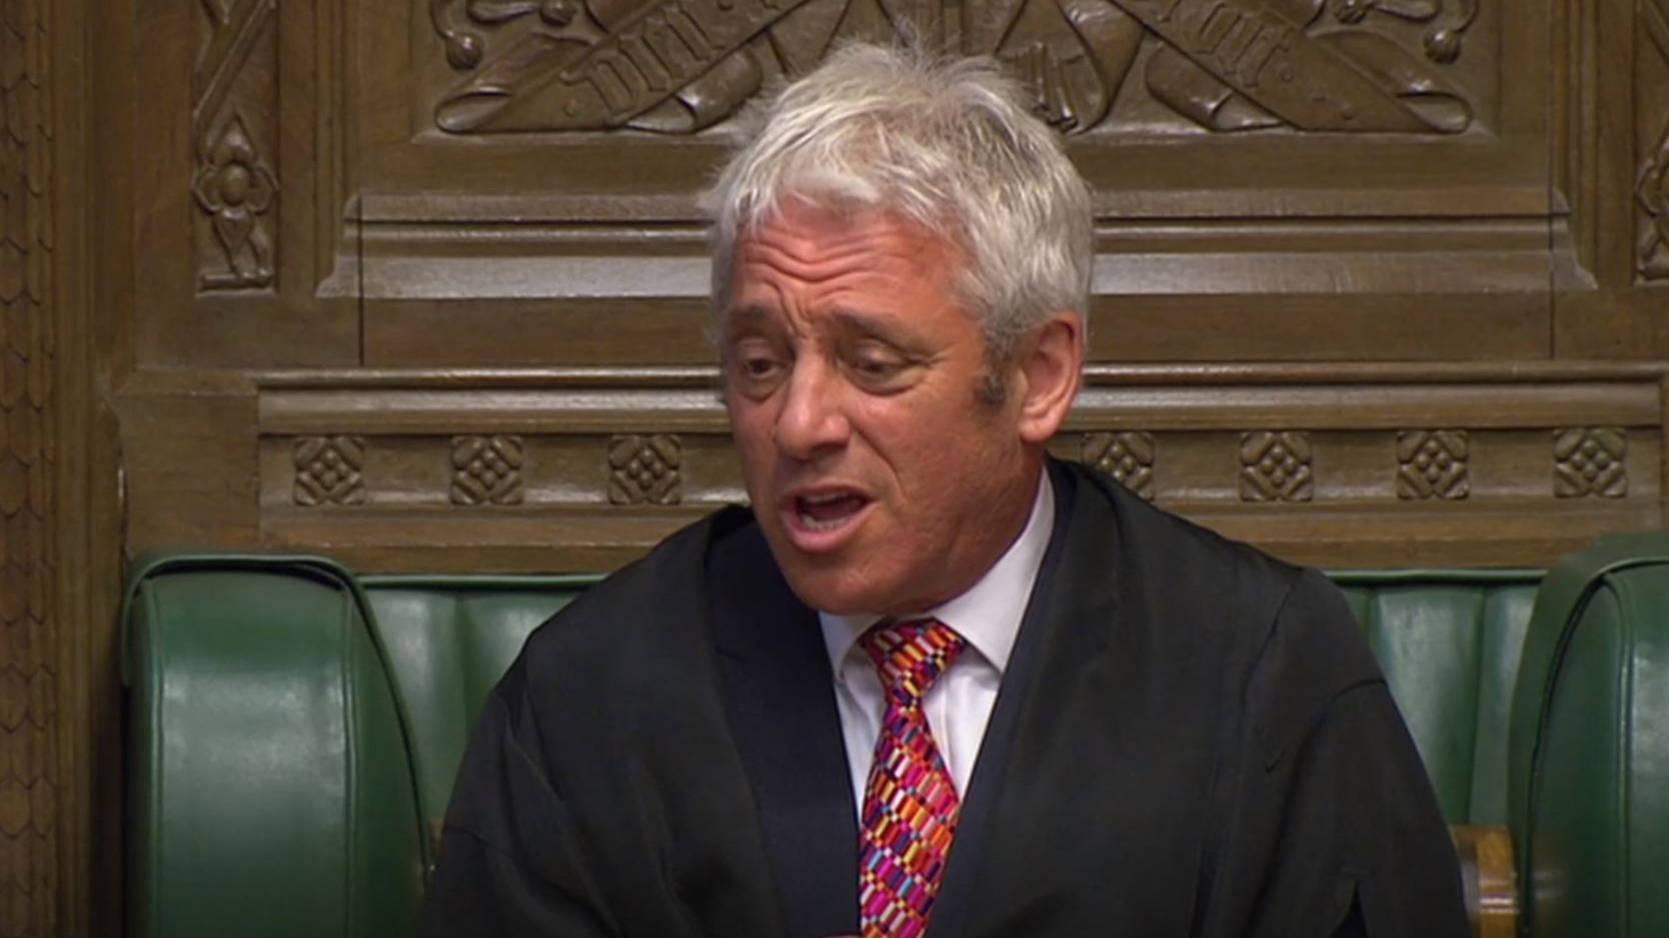 Labour 'nominating former Tory speaker John Bercow for peerage'